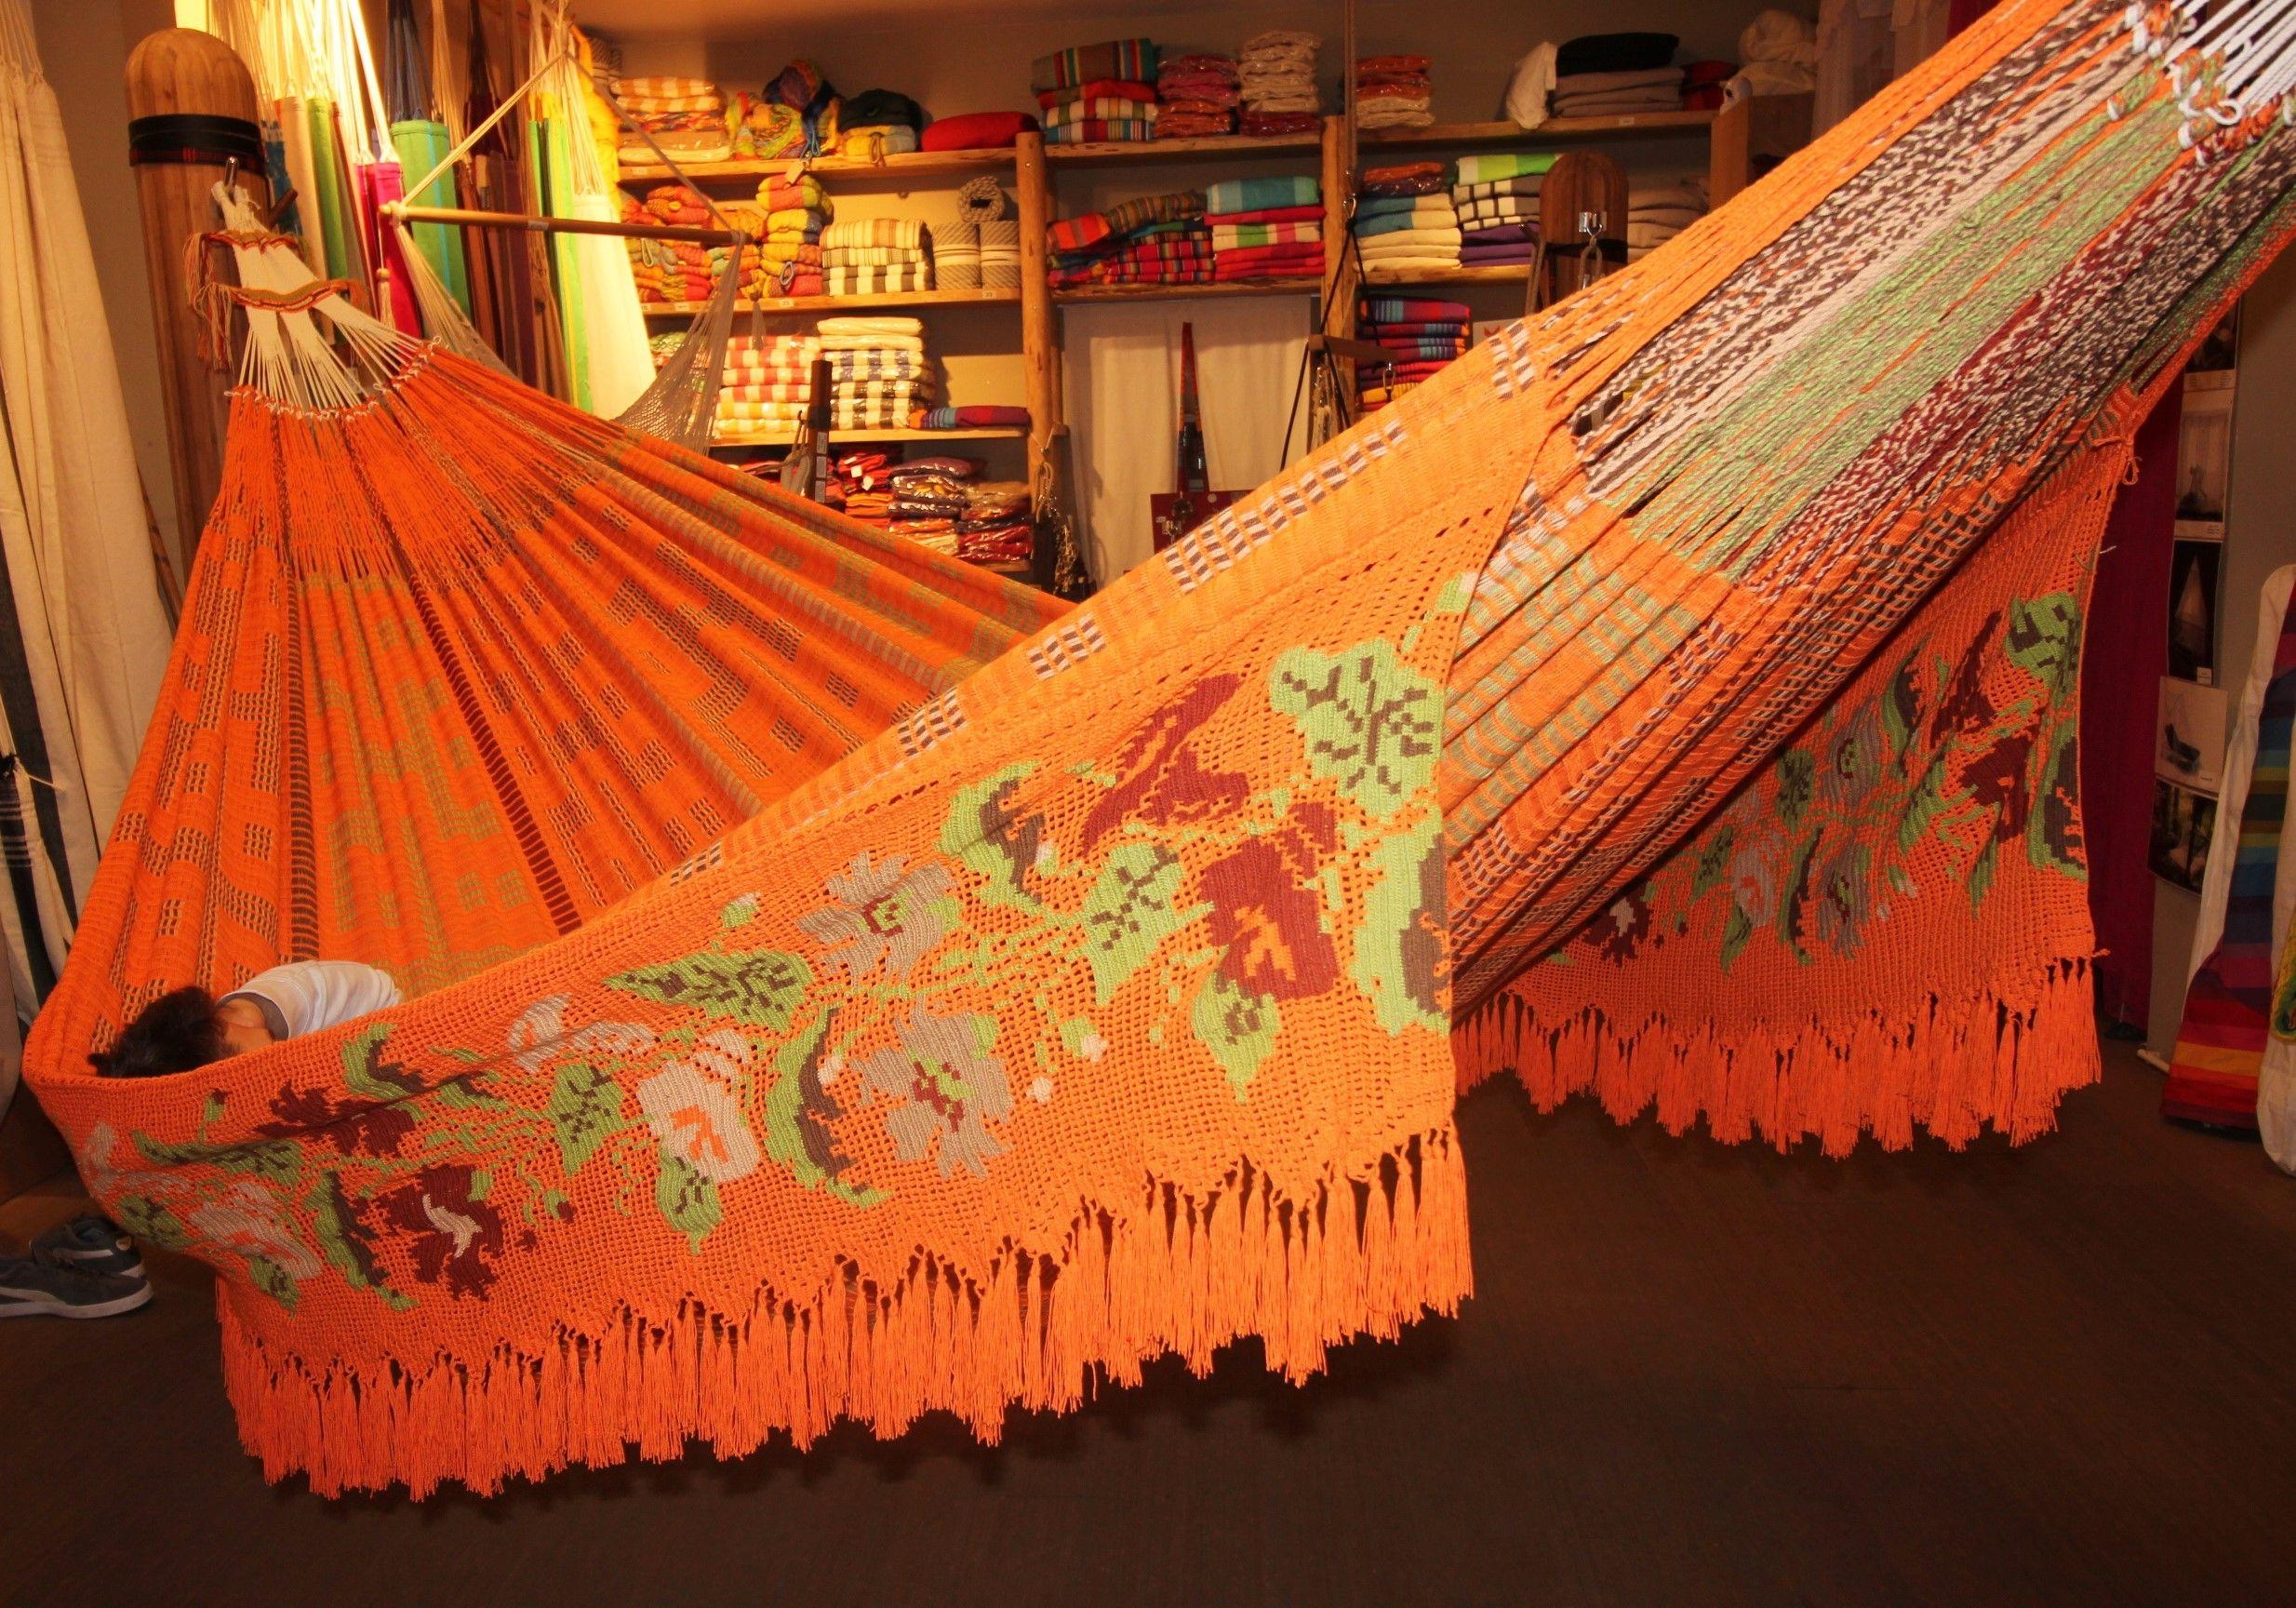 Hangmat Kopen Winkel.Wayuu Hangmat Xxl Maranon Hangmatten Winkel Pinterest